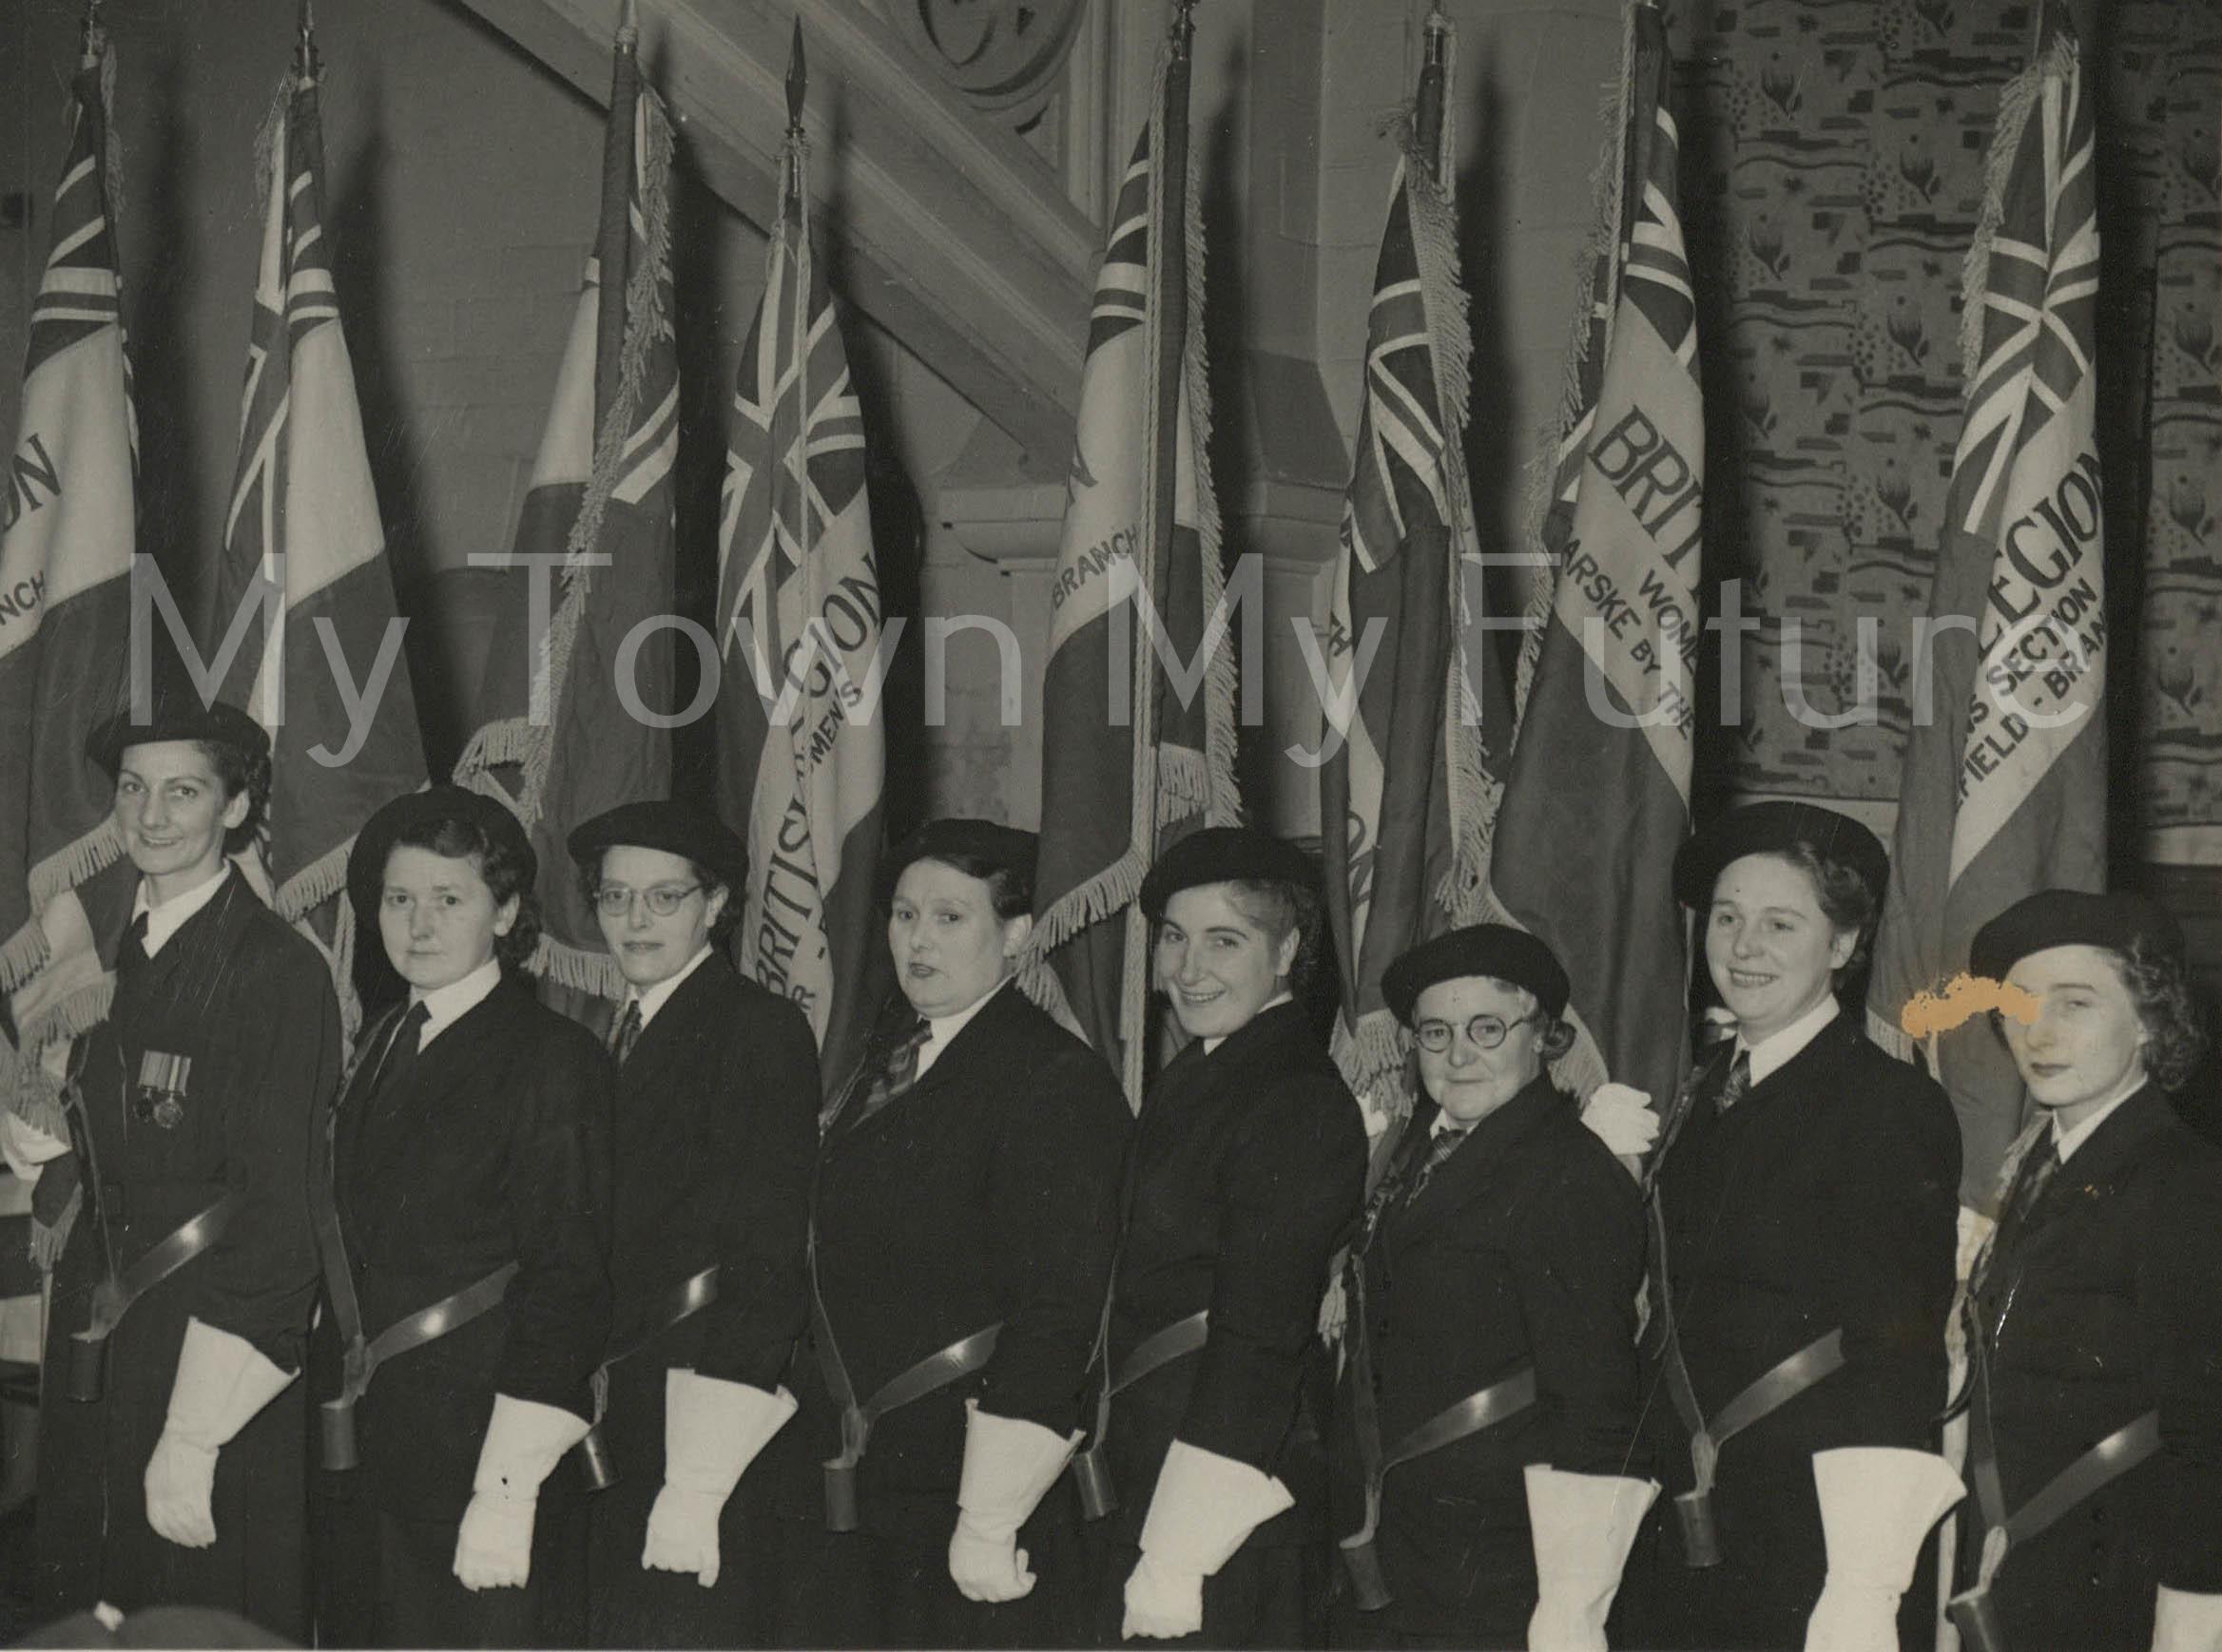 Royal British Legion Festival Of Remembrance 15th November 1953